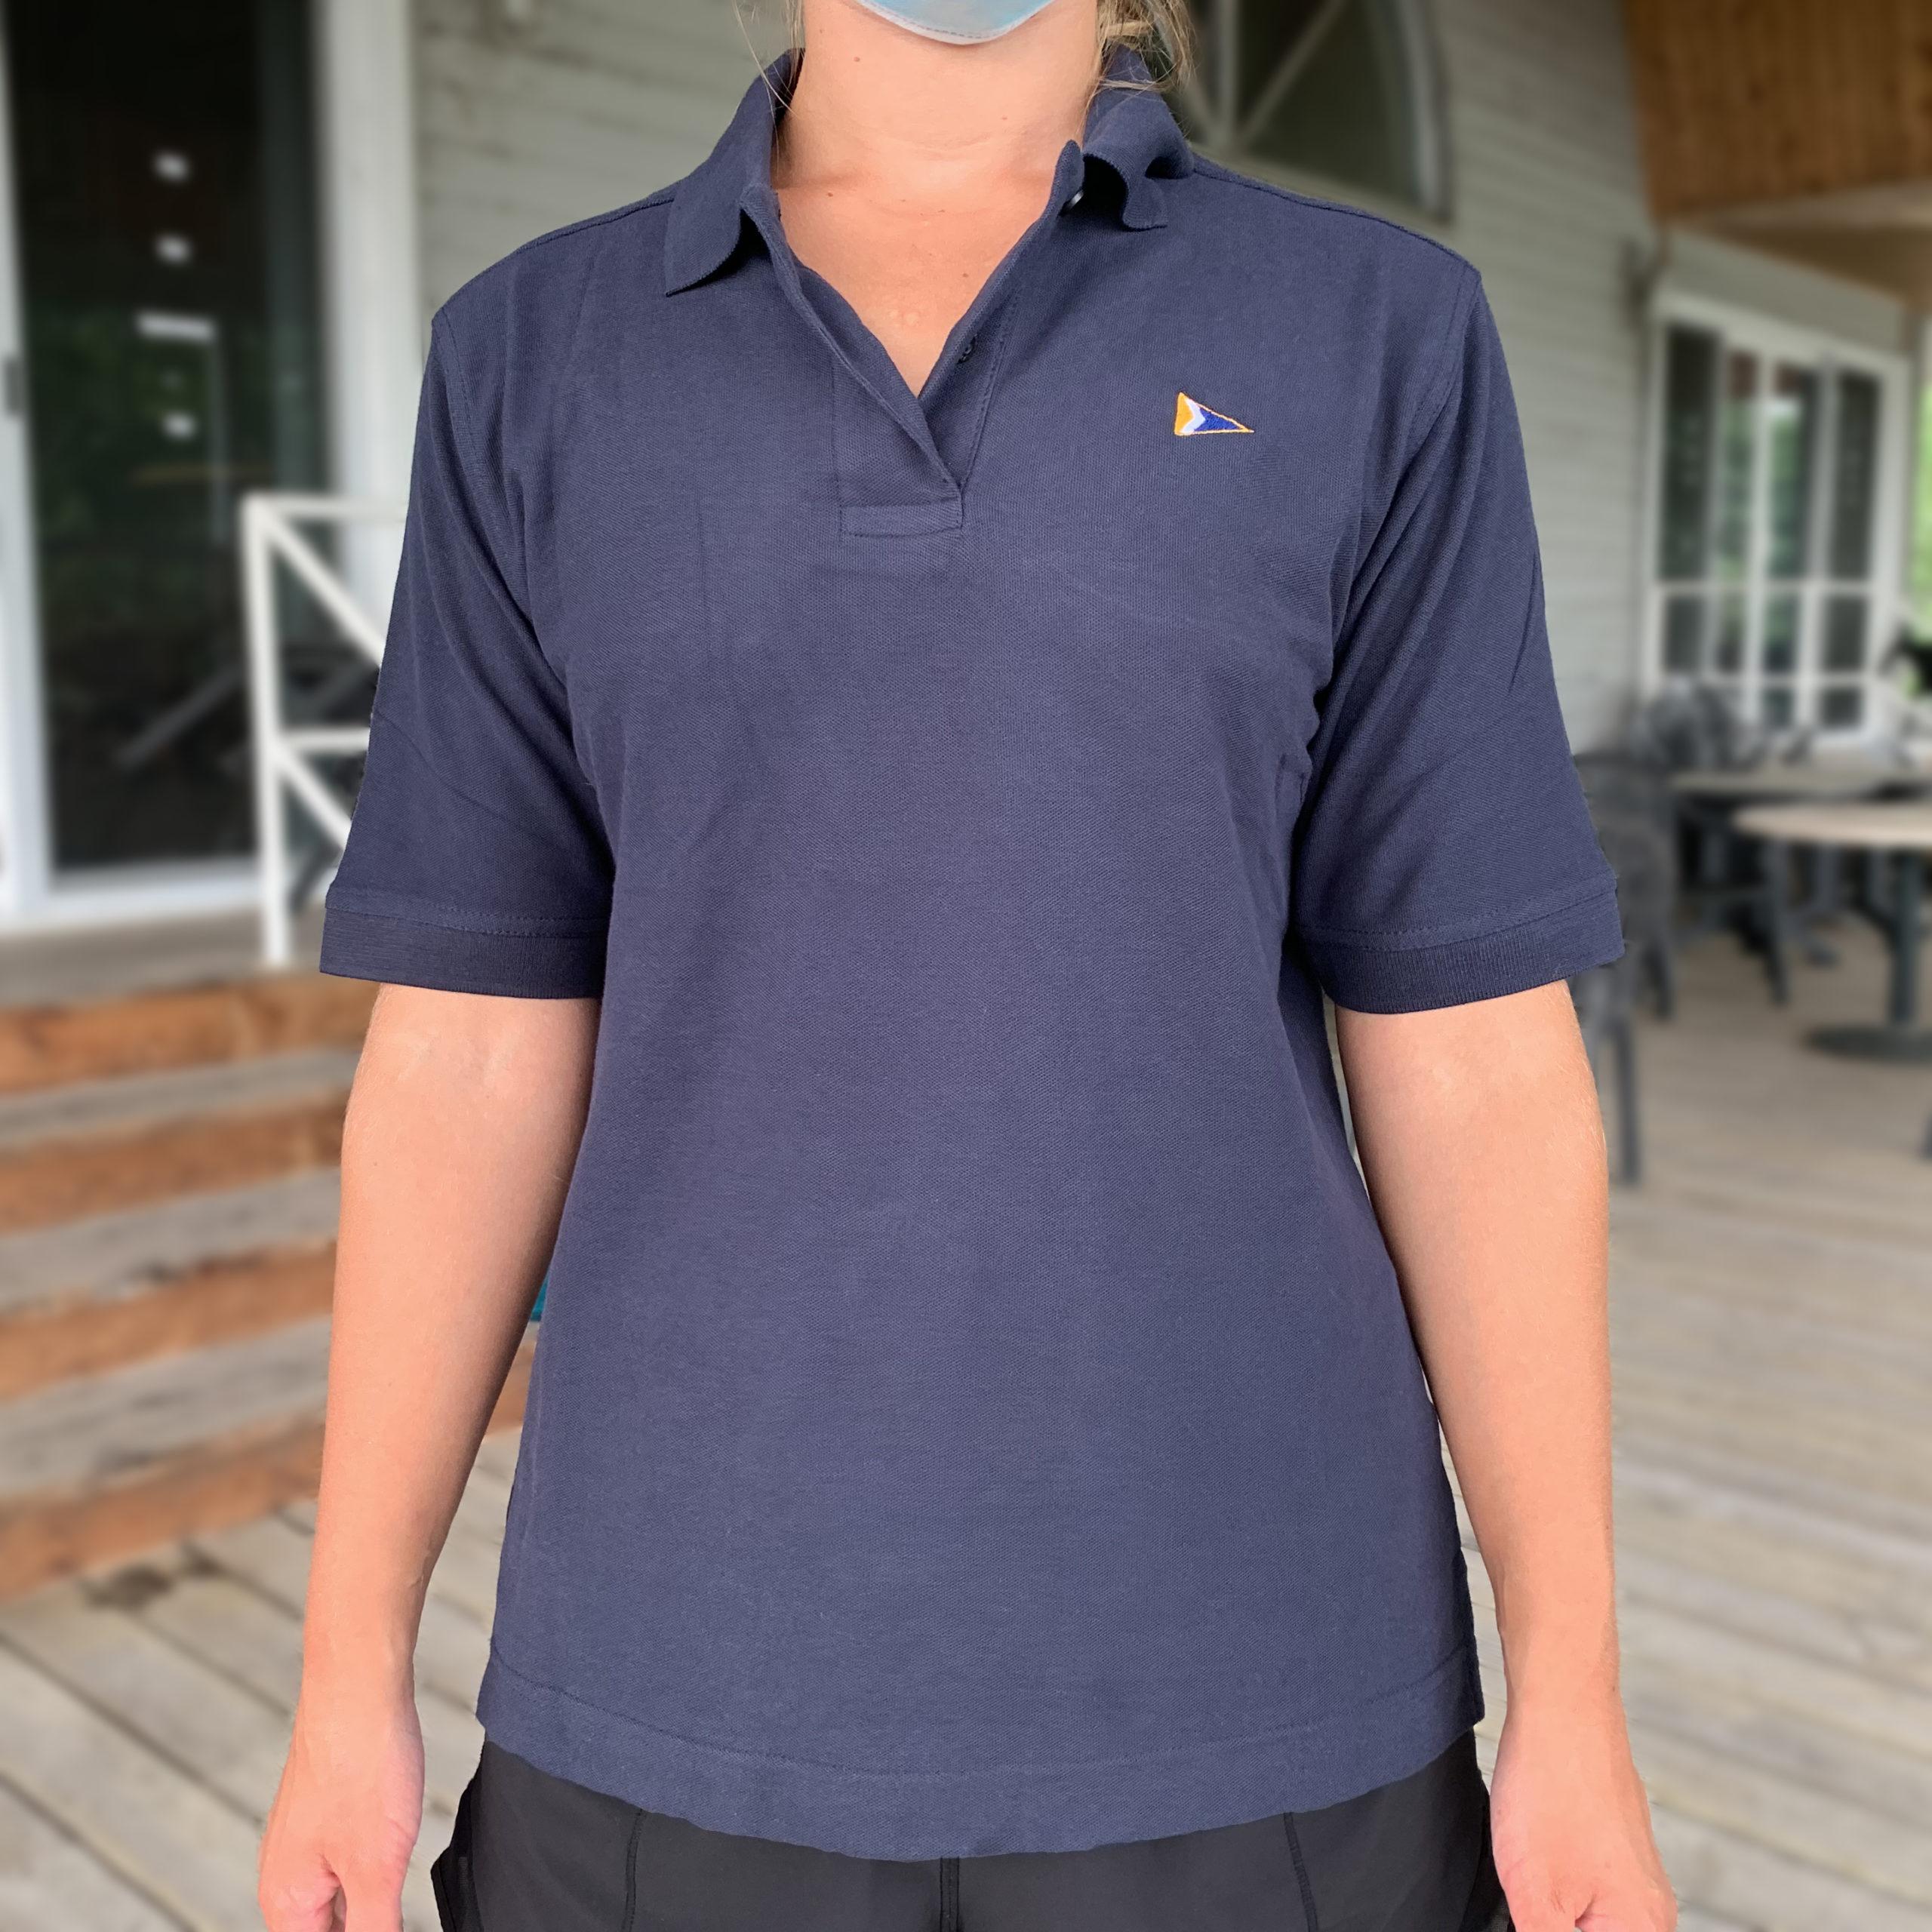 Ladies' Polo, Navy - $25